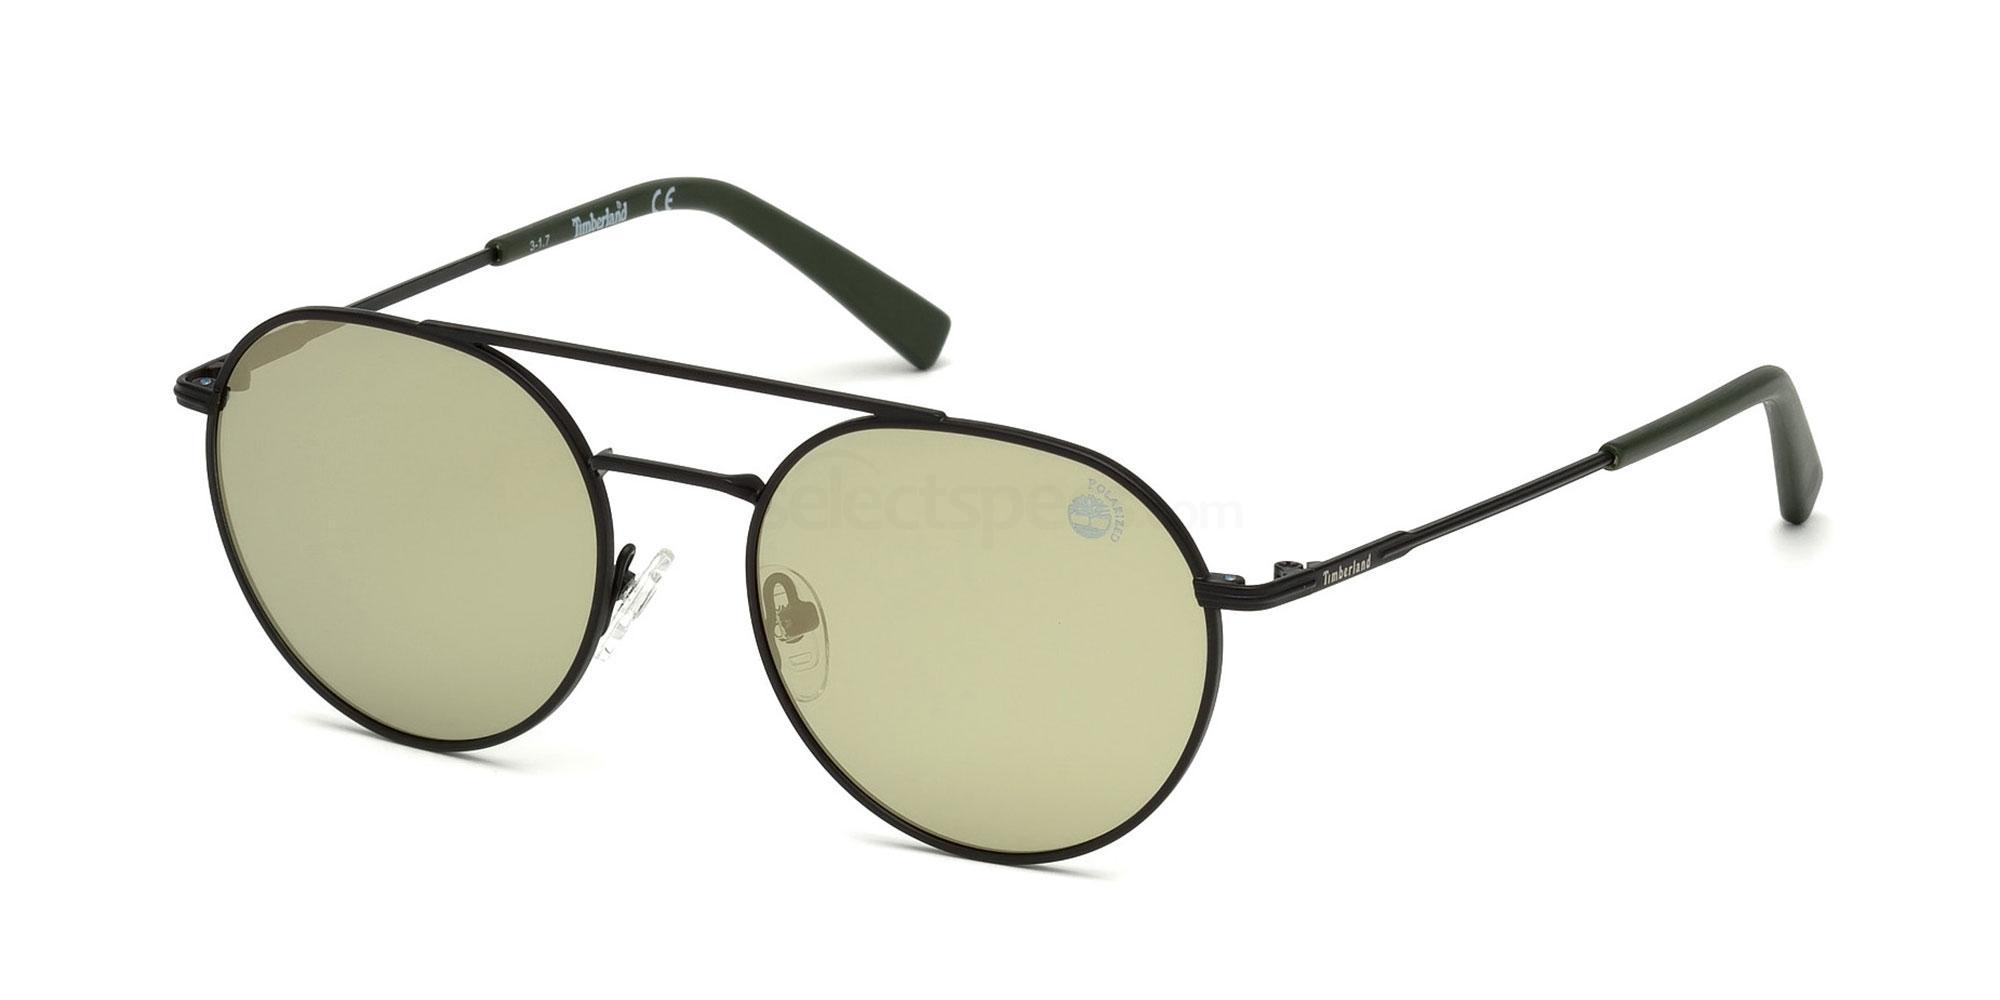 02R TB9123 Sunglasses, Timberland